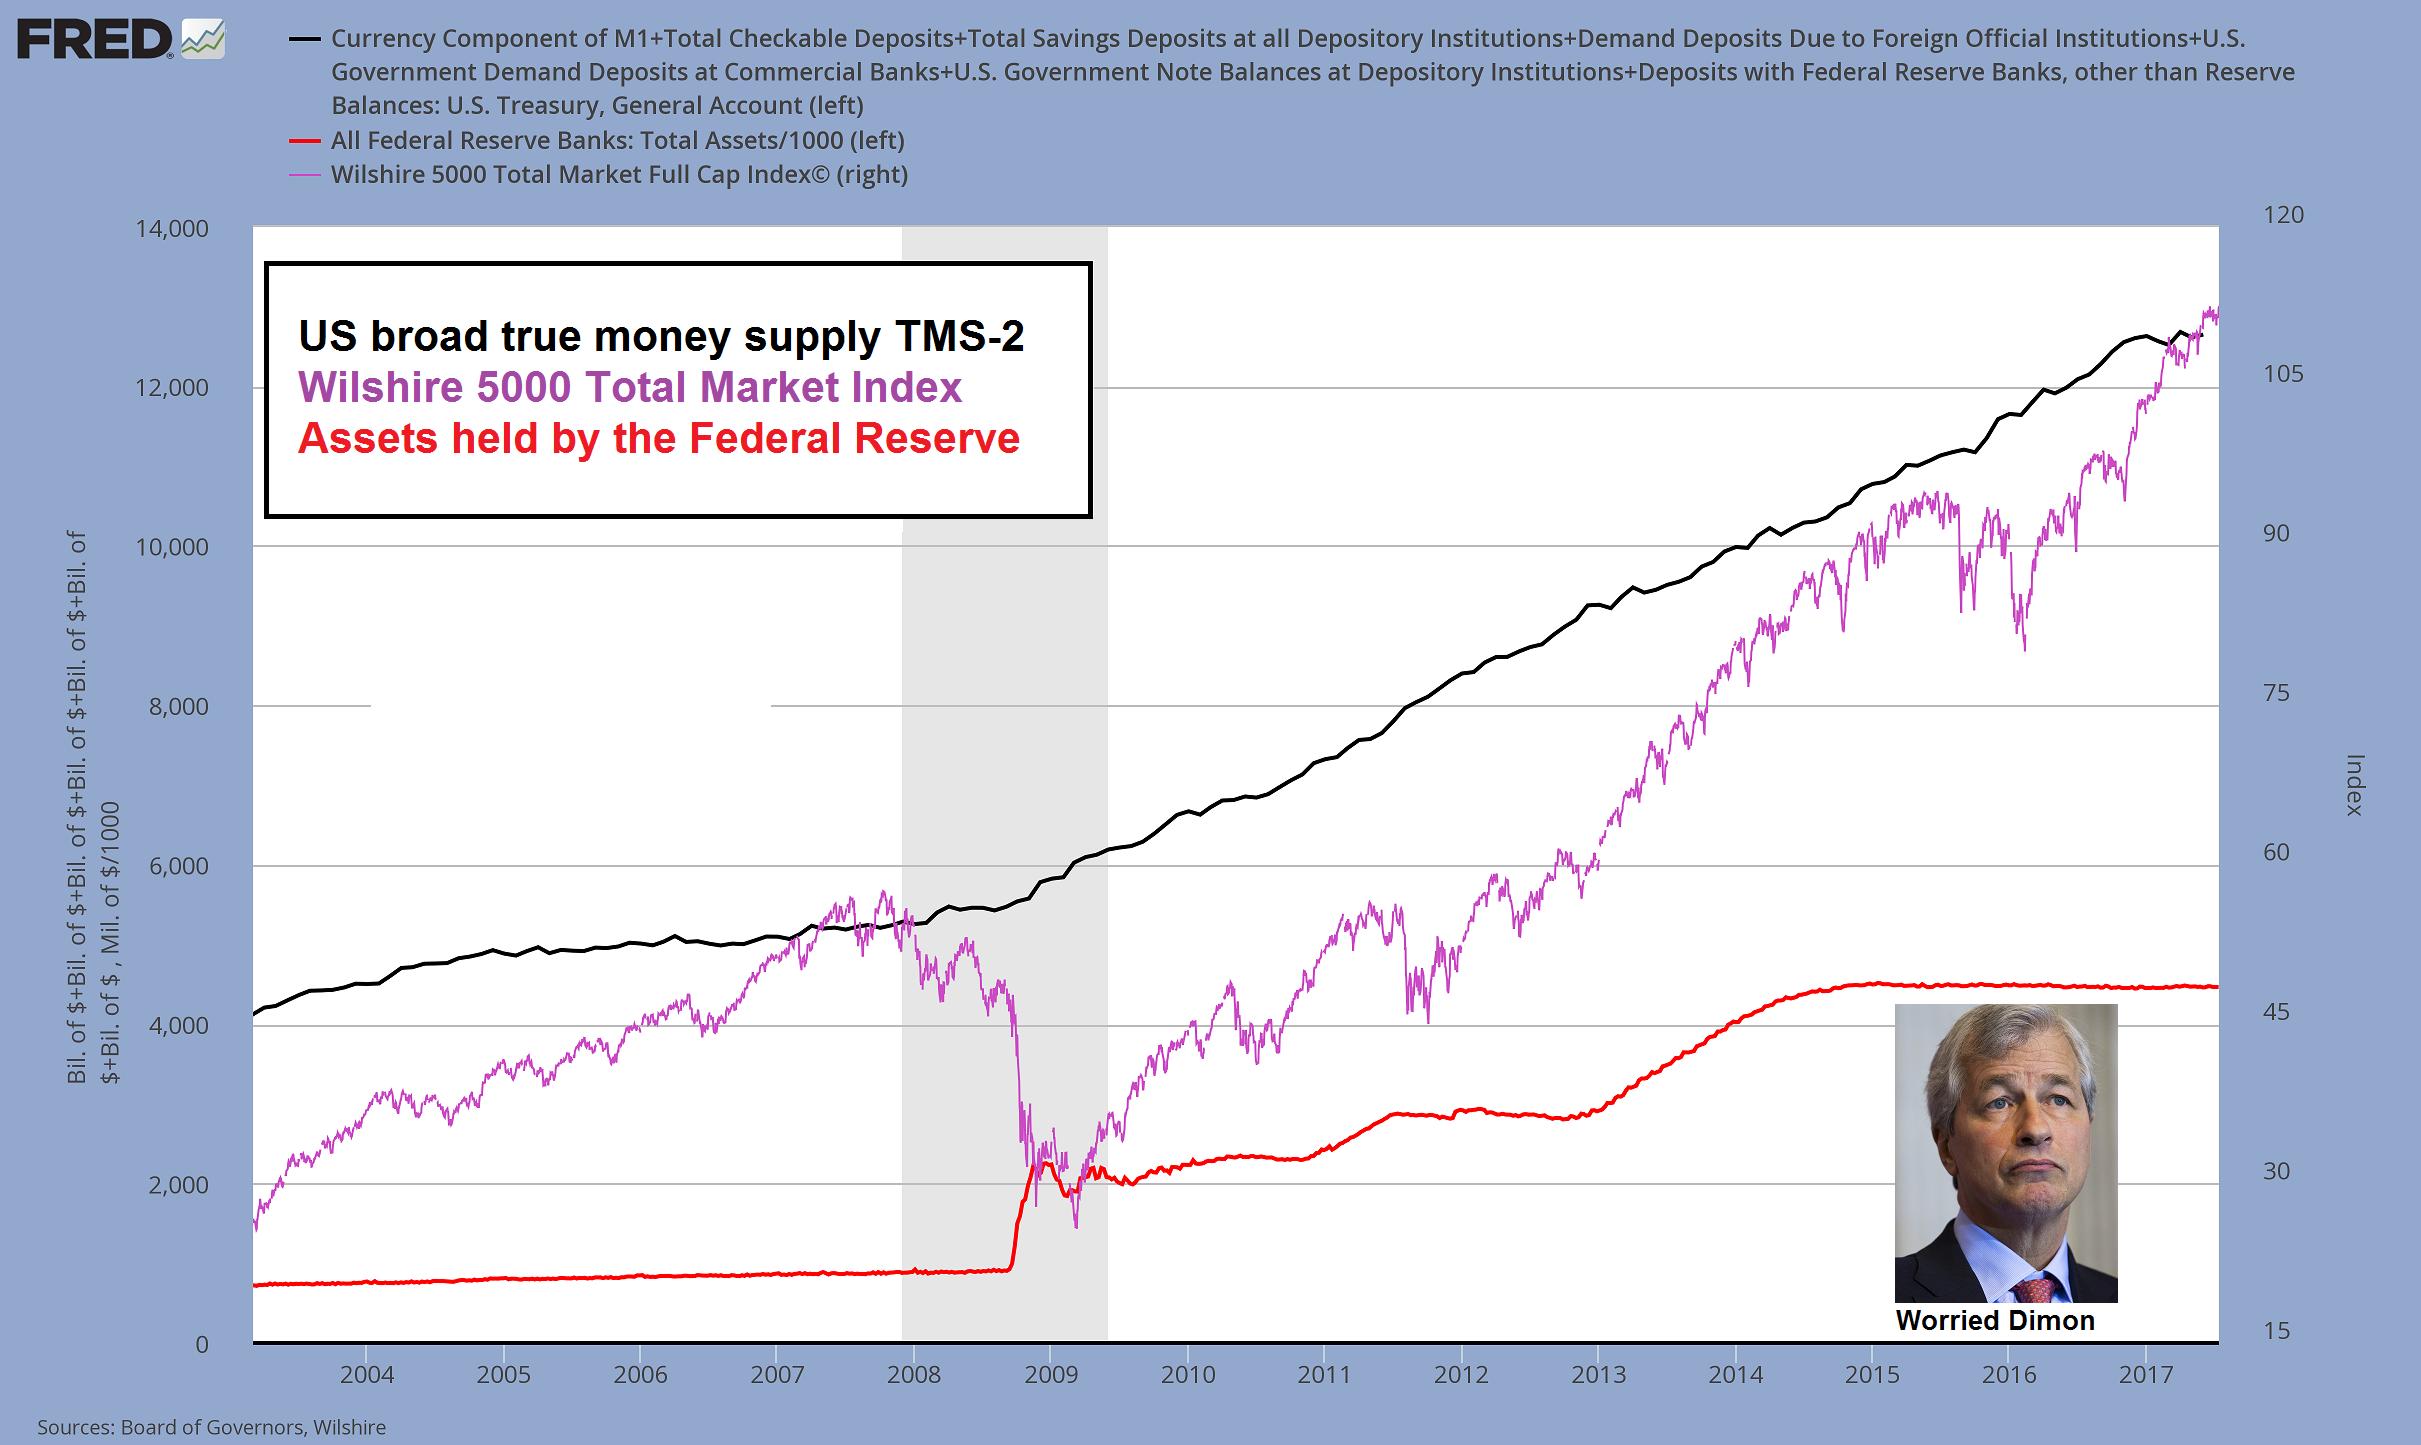 US Broad Tru Money Supply TMS-2